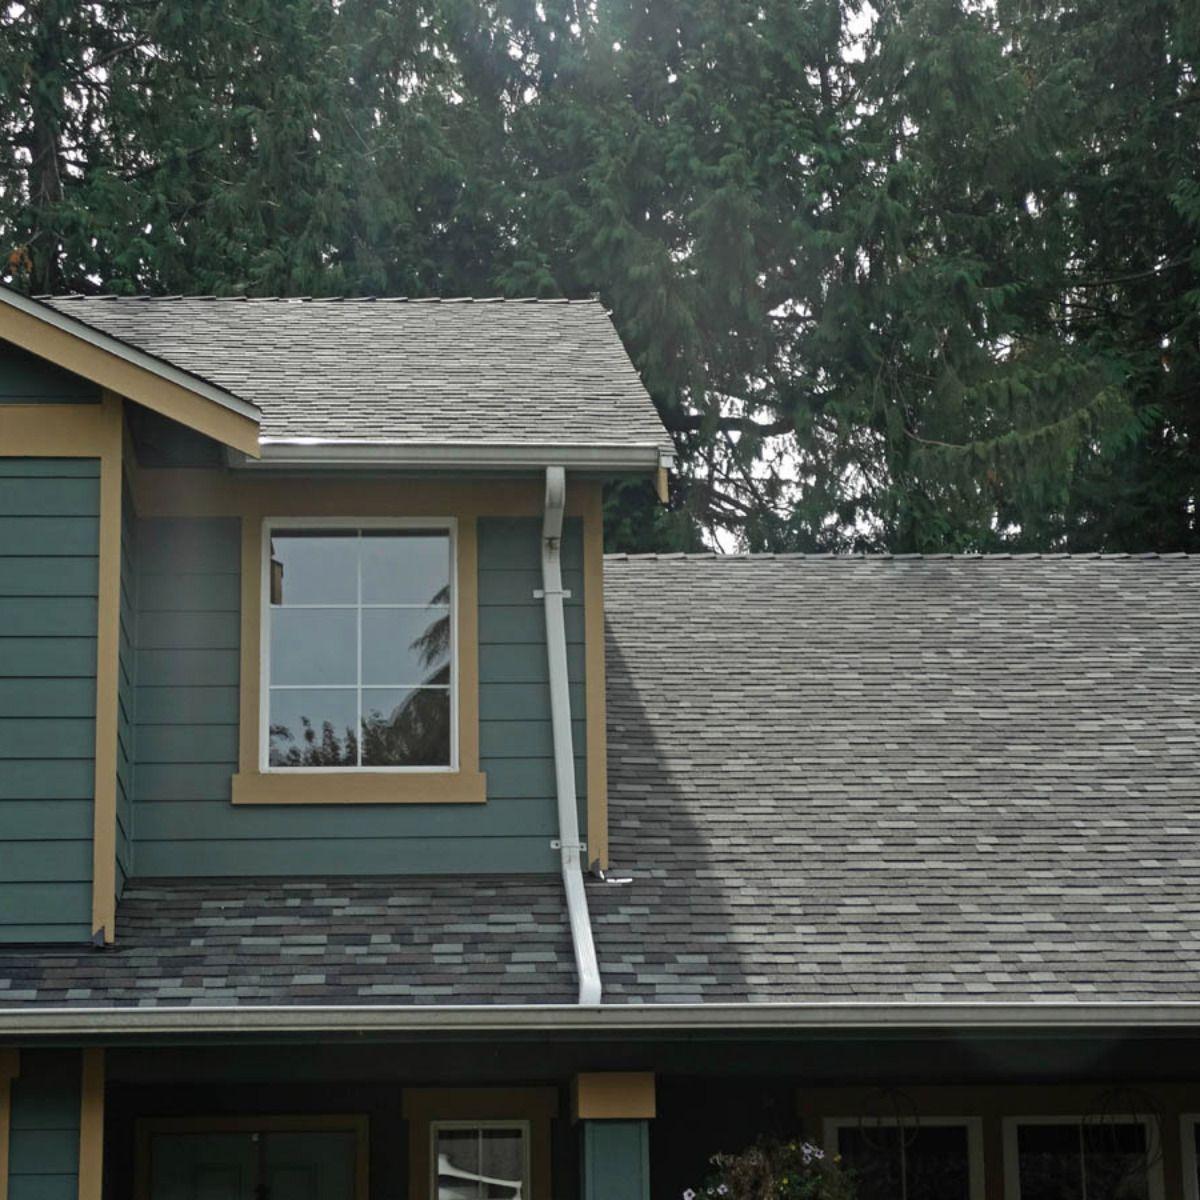 Roofing Contractor Seattle In 2020 Roofing Contractors Roofing Roof Repair